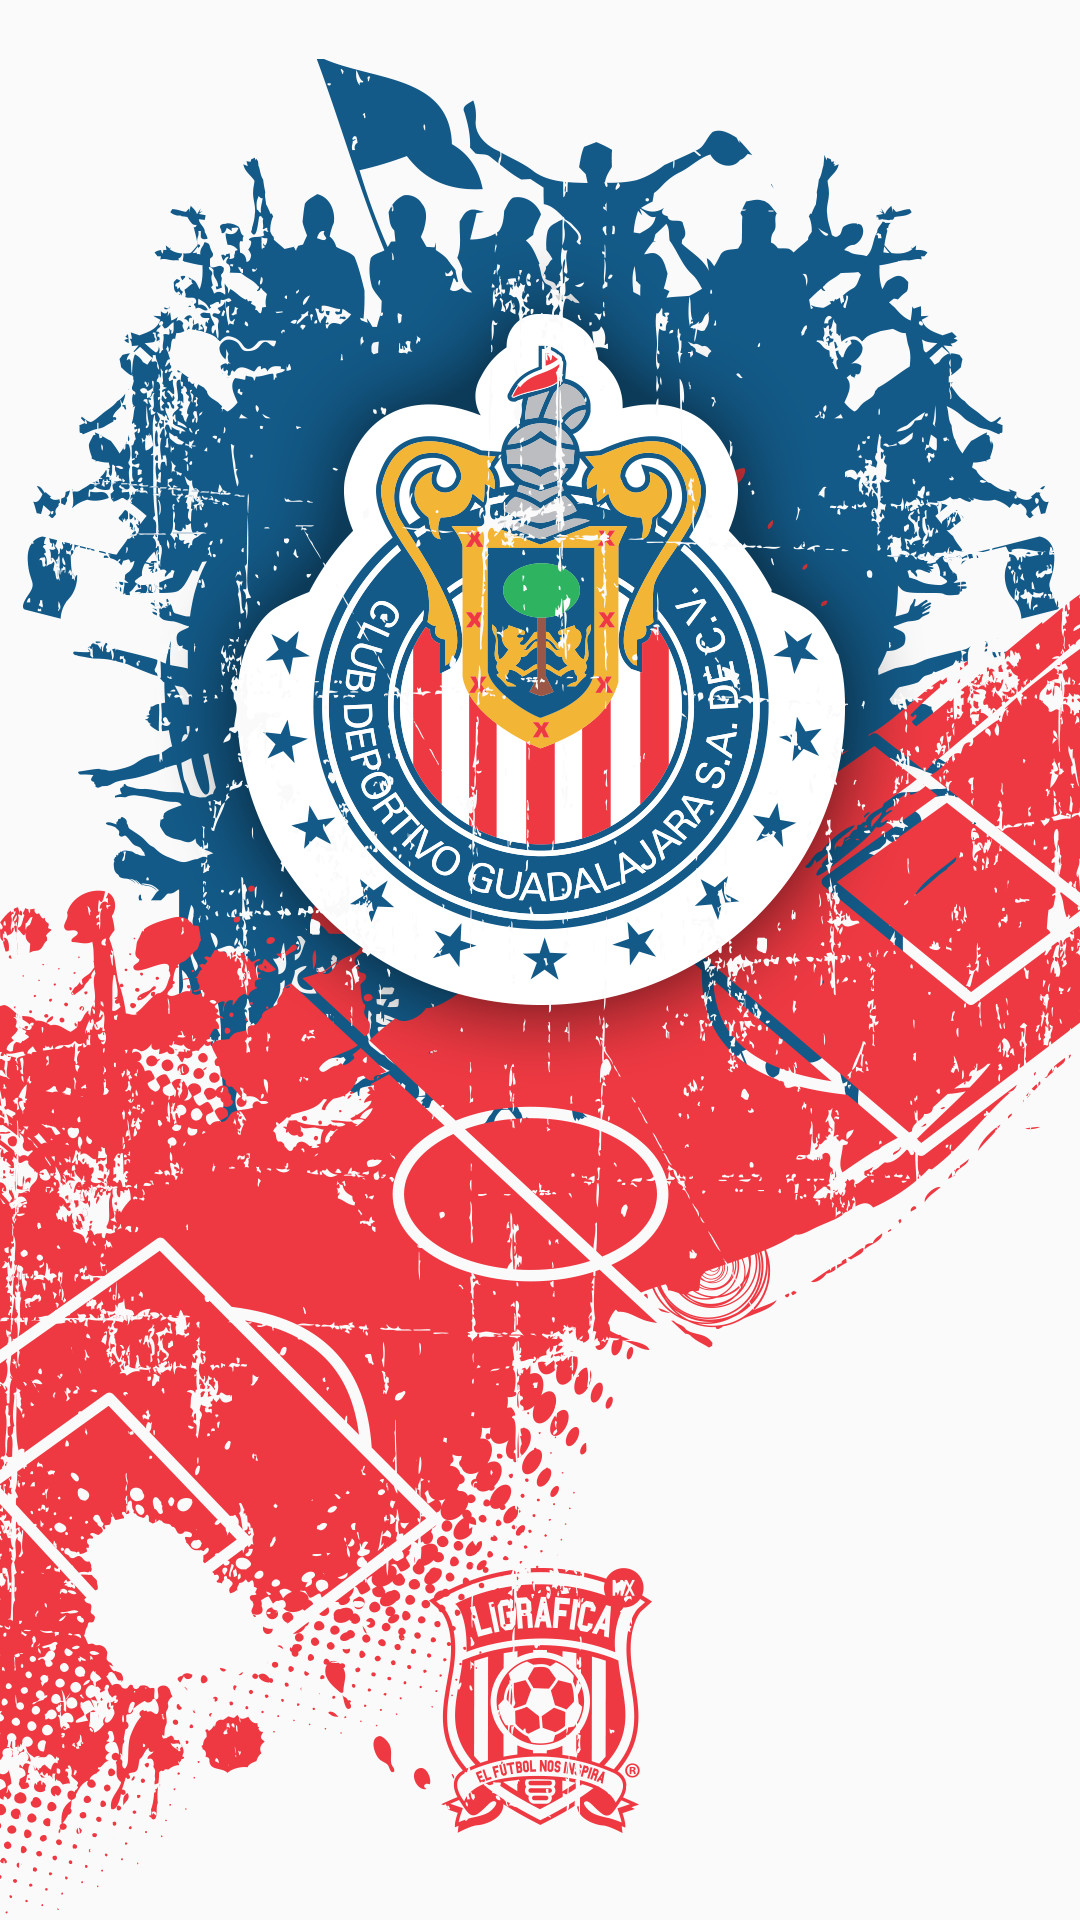 #Chivas #LigraficaMX ·131114CTG